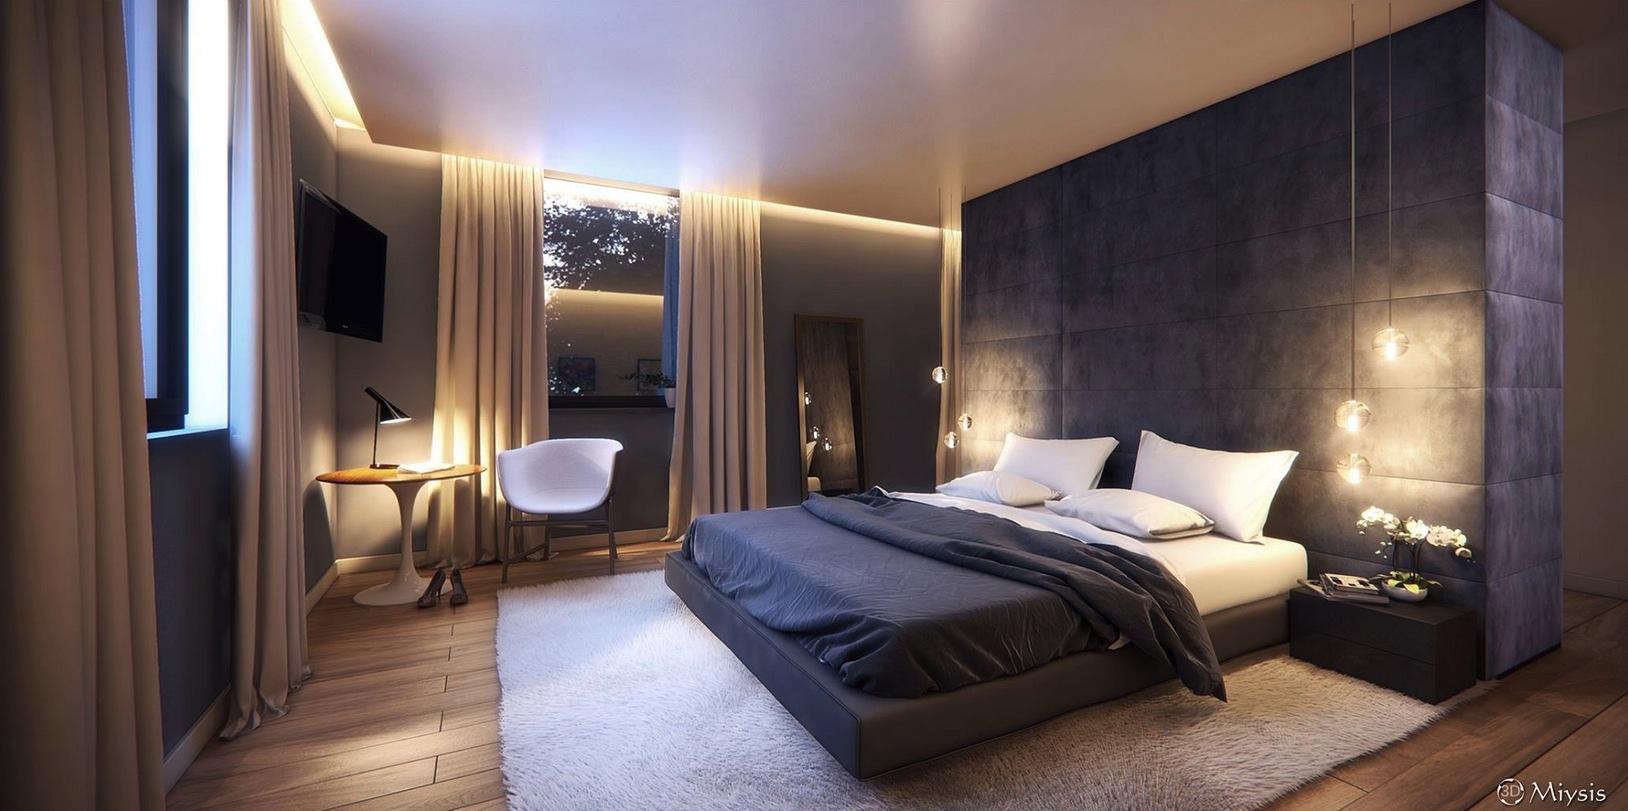 Best Kitchen Gallery: An Easy Way To Create Minimalist Bedroom Decorating Ideas With Dark of Design Bedroom  on rachelxblog.com